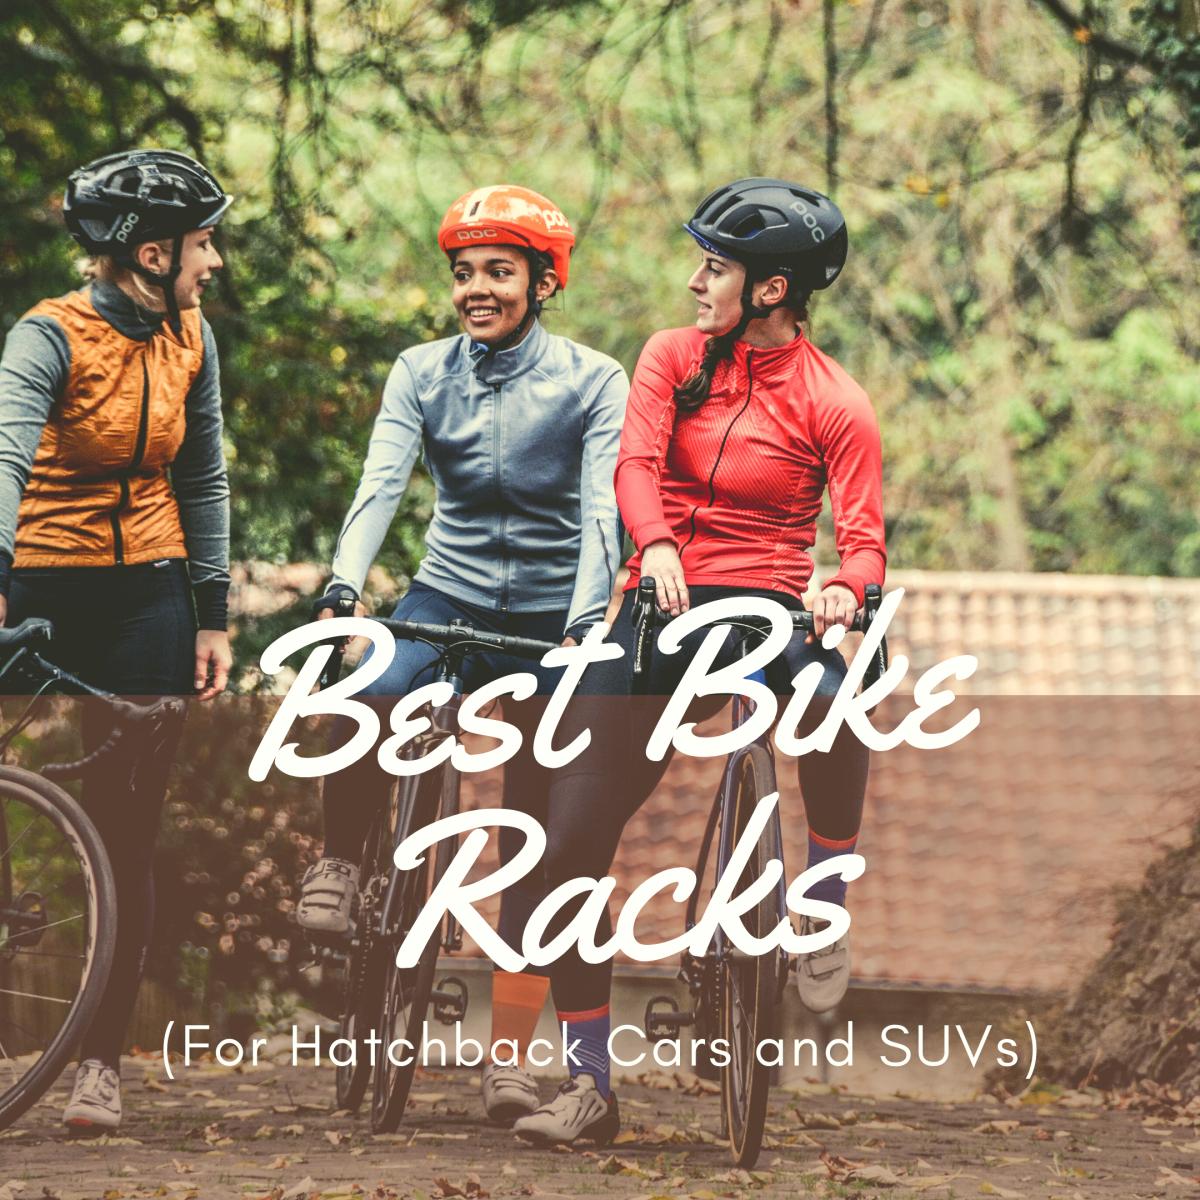 3 Best Bike Racks (for Hatchback Cars)